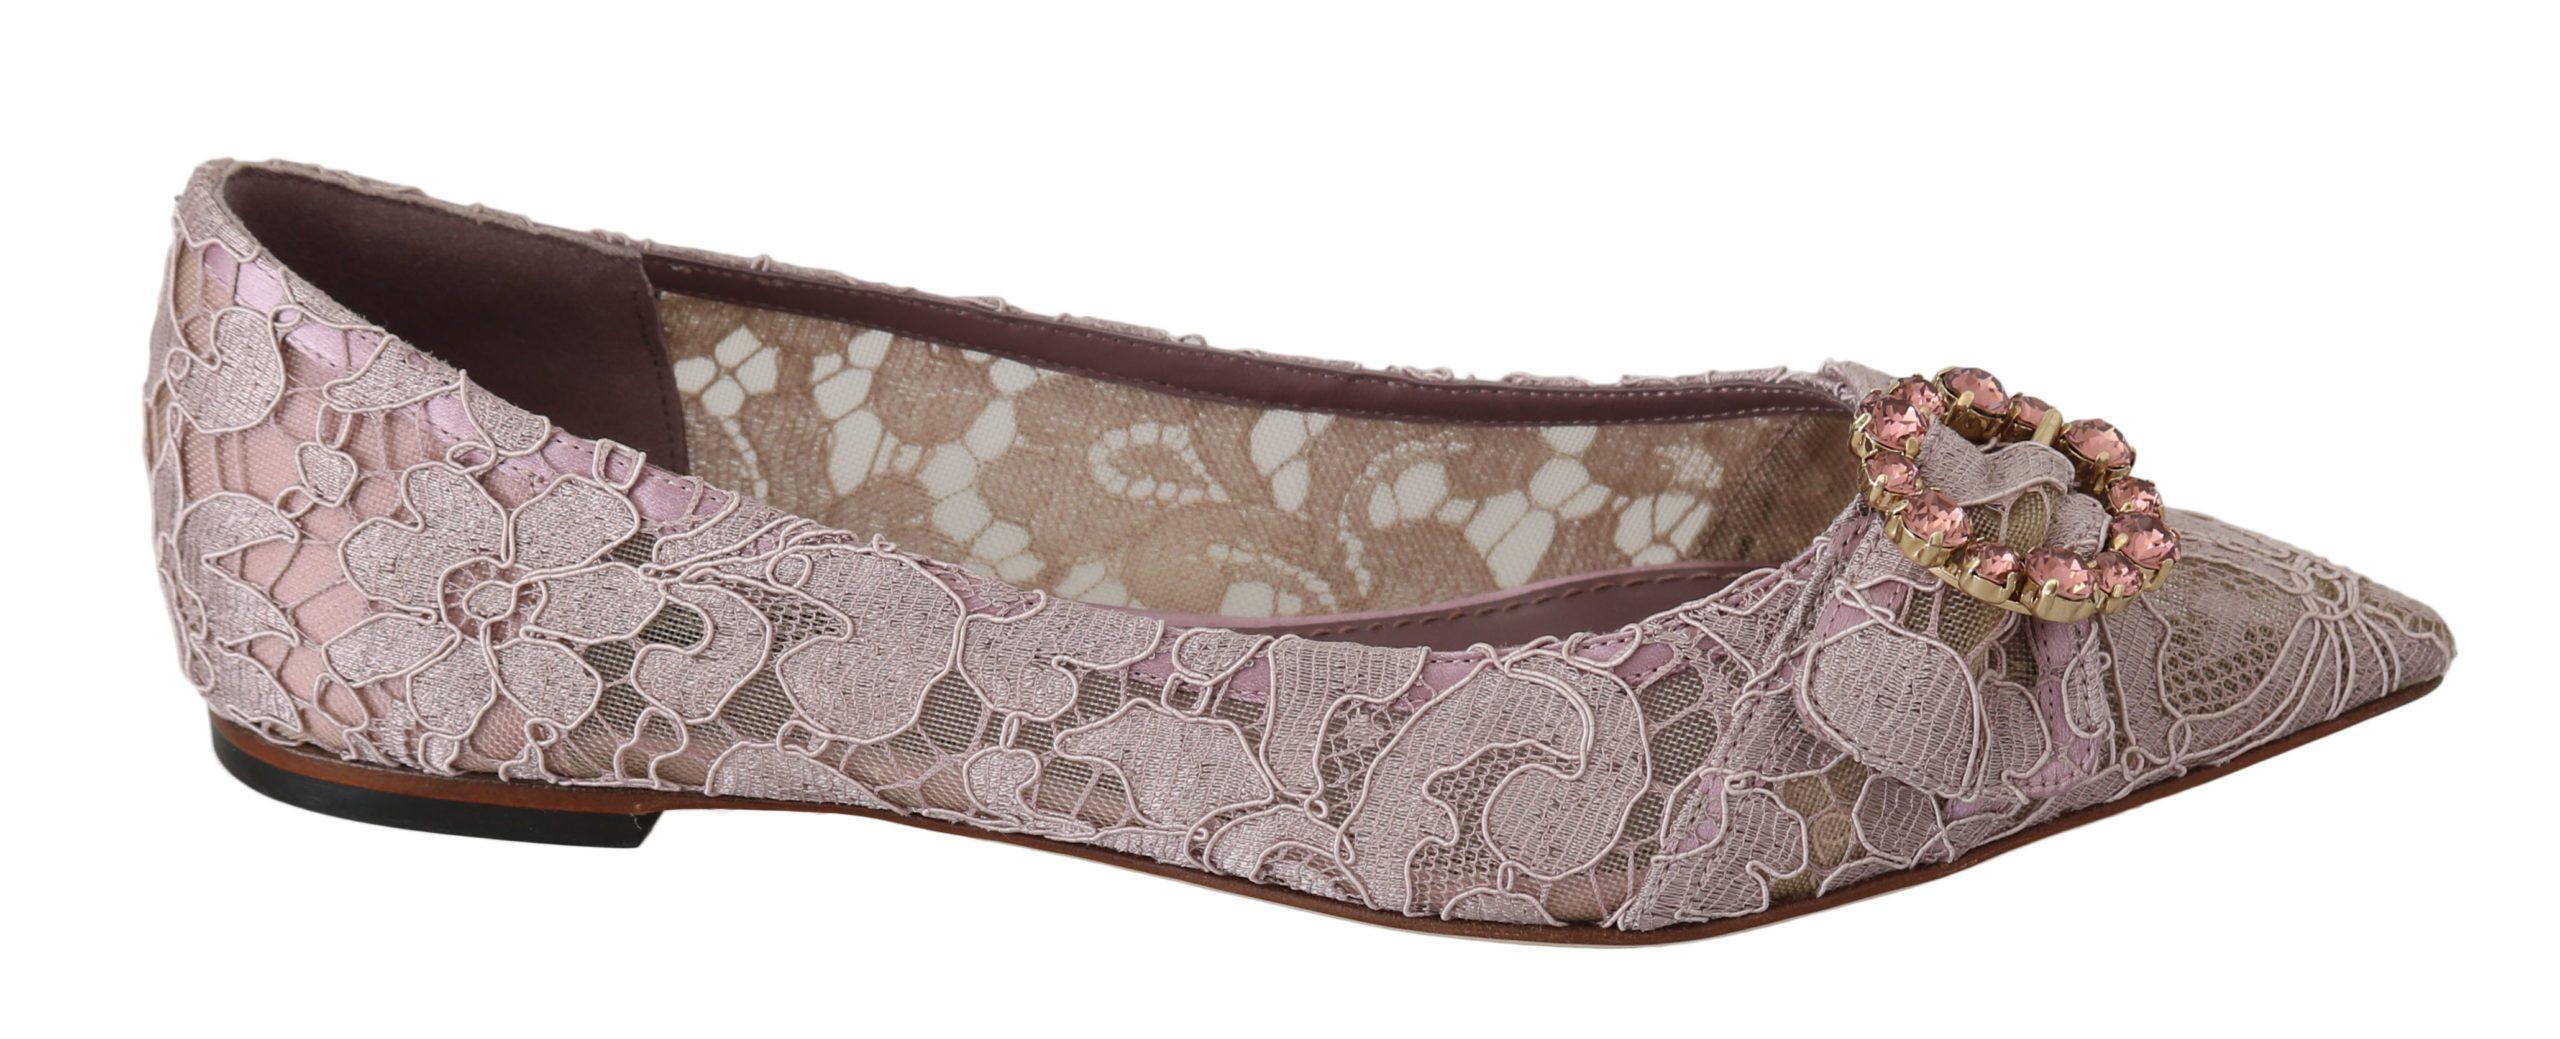 Dolce & Gabbana Women's Floral Lace Crystal Loafer Pink LA6287 - EU37/US6.5